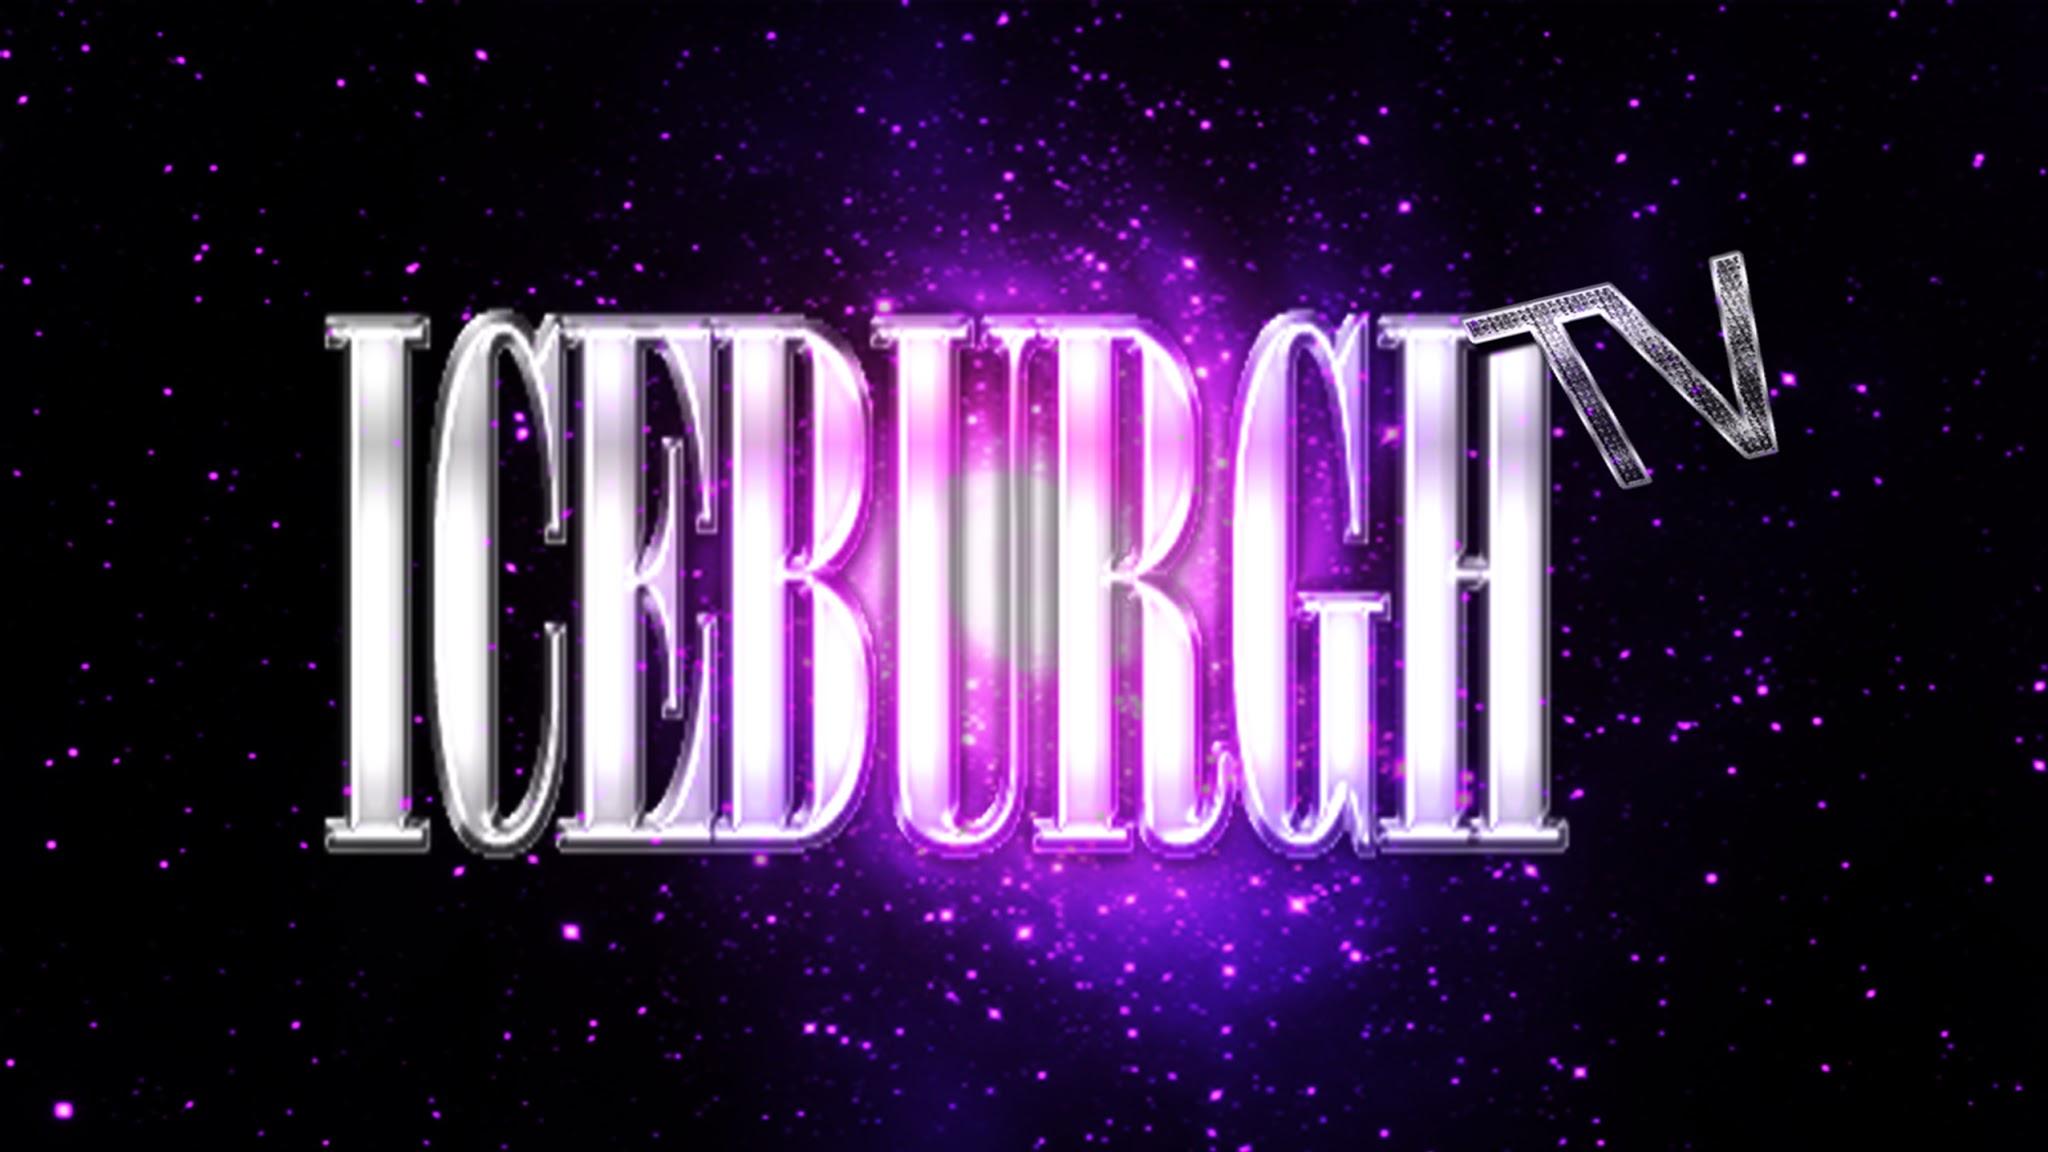 IceburghTV